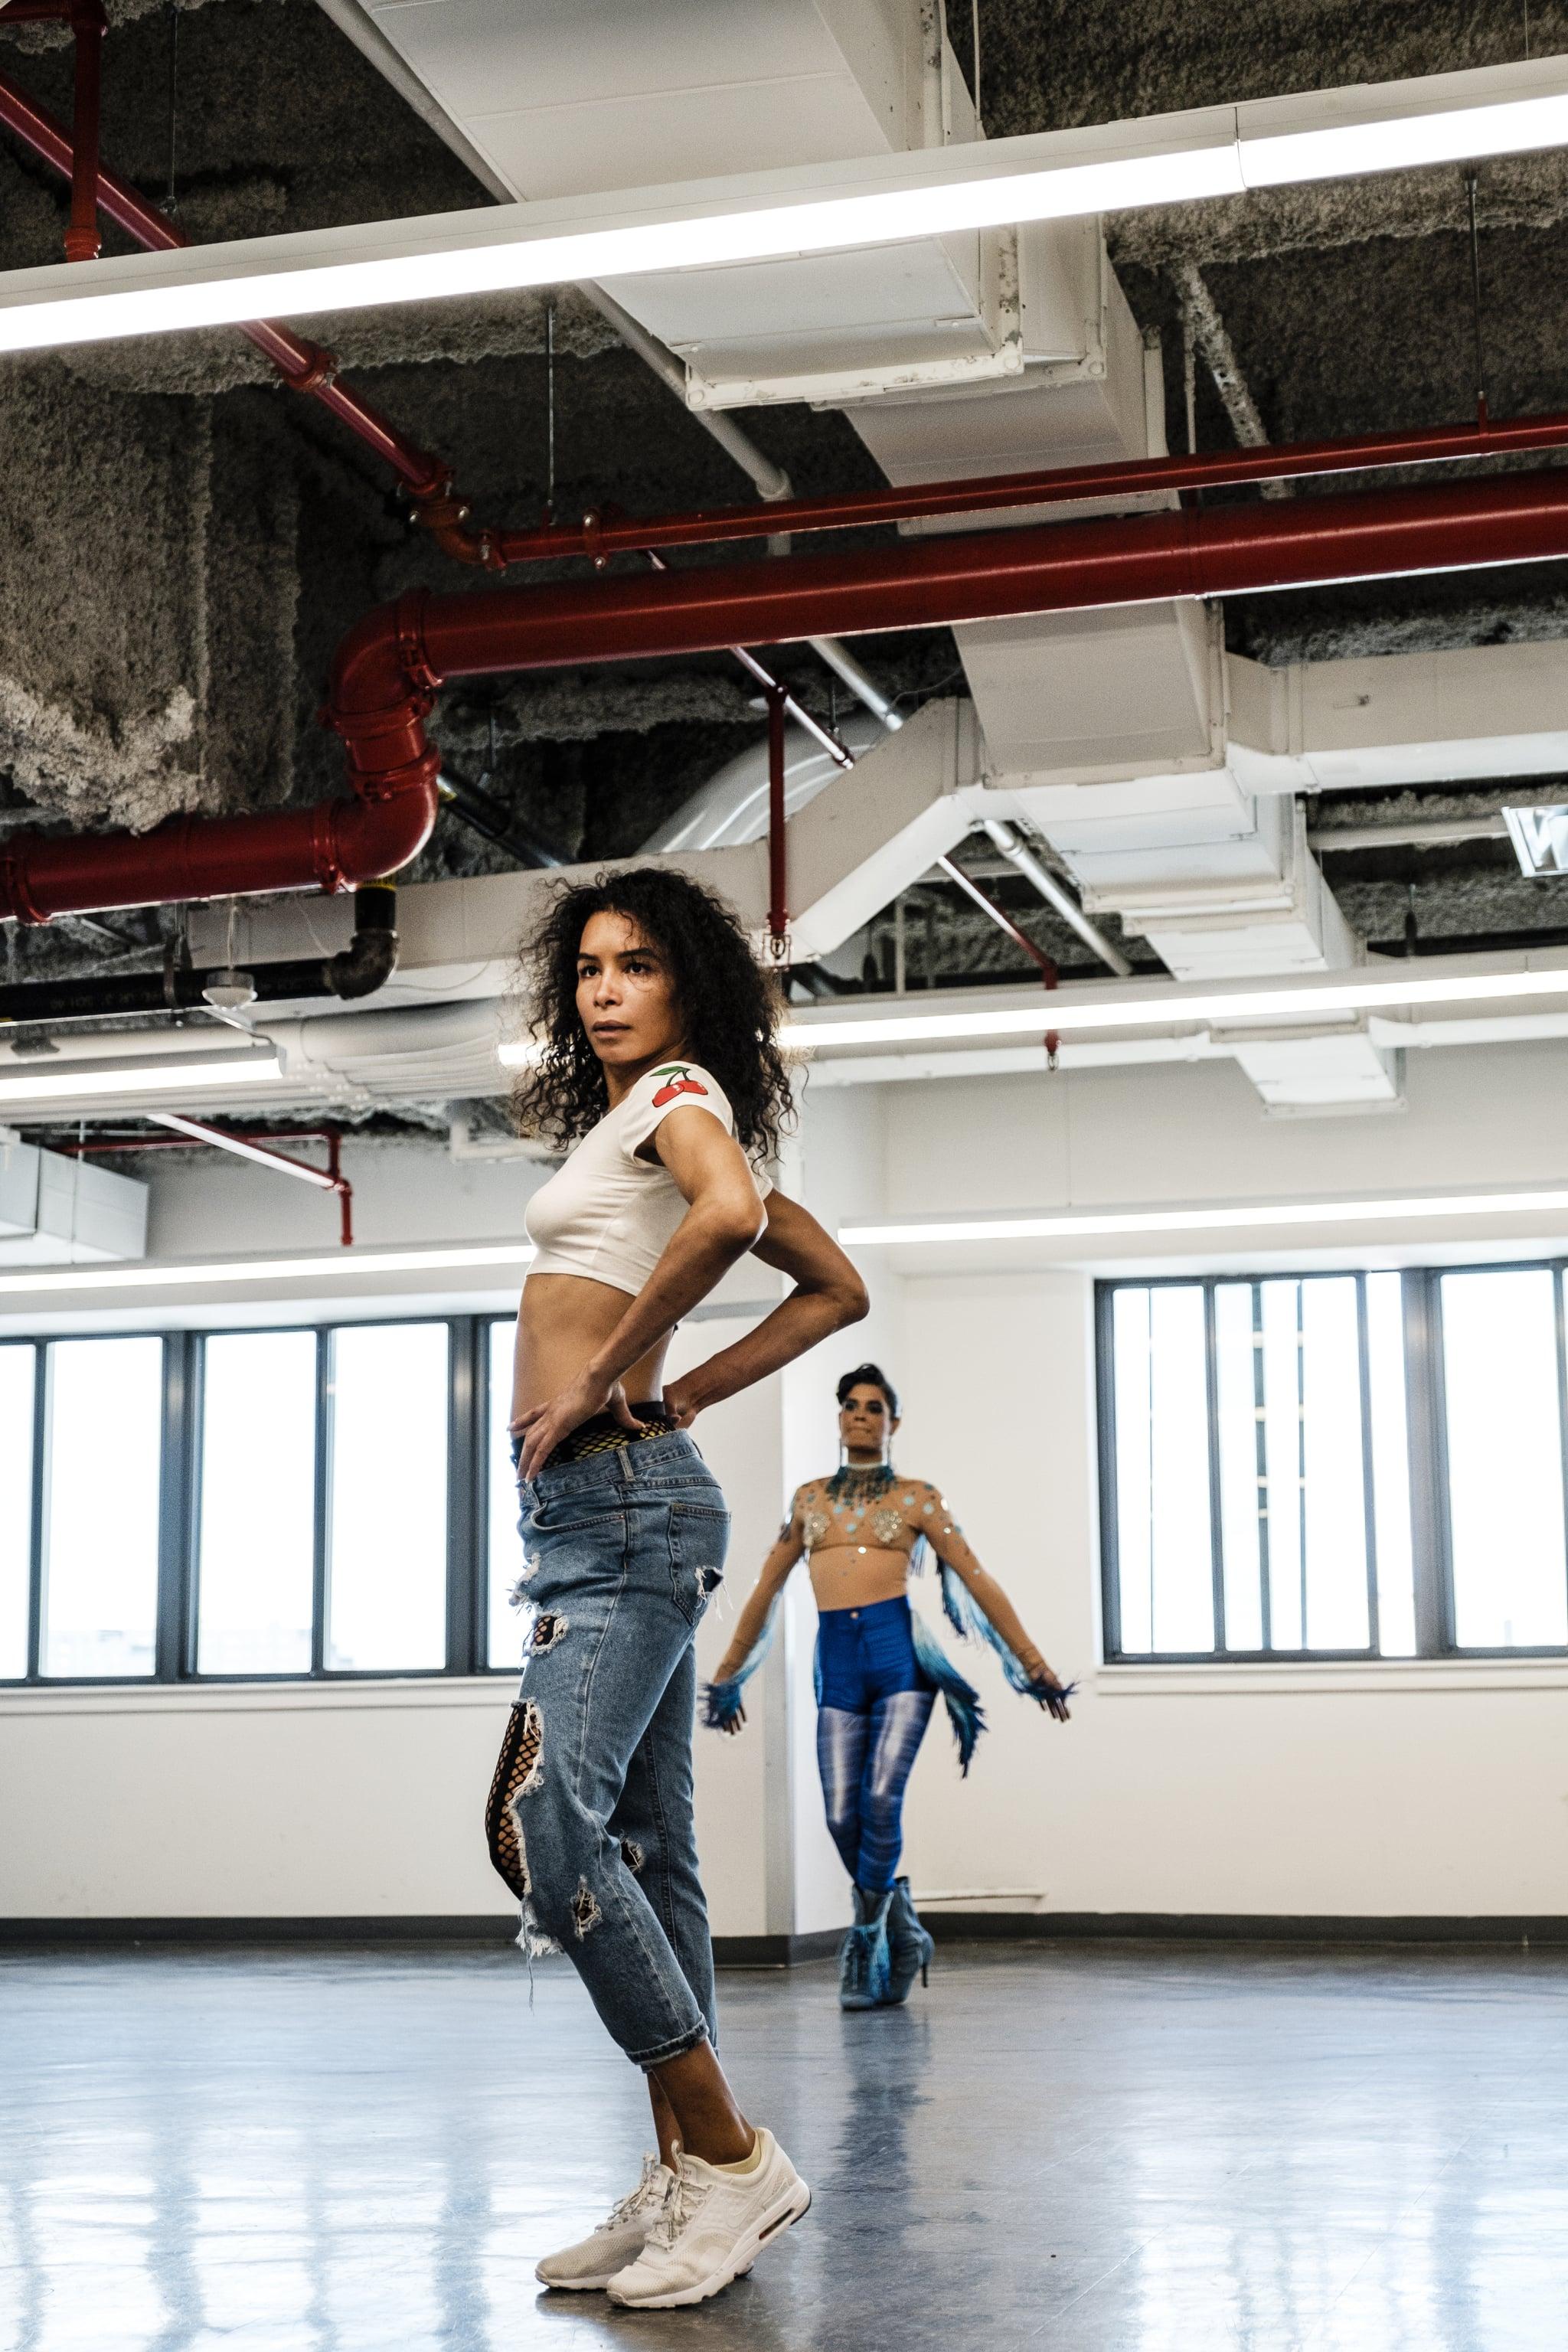 NEW YORK, NY - MAY 16: Choreographer Leiomy Maldonado rehearses an upcoming dance scene in POSE at Silvercup Studios North in New York, NY on May 16, 2019. (Photo by Chris Sorensen for The Washington Post via Getty Images)